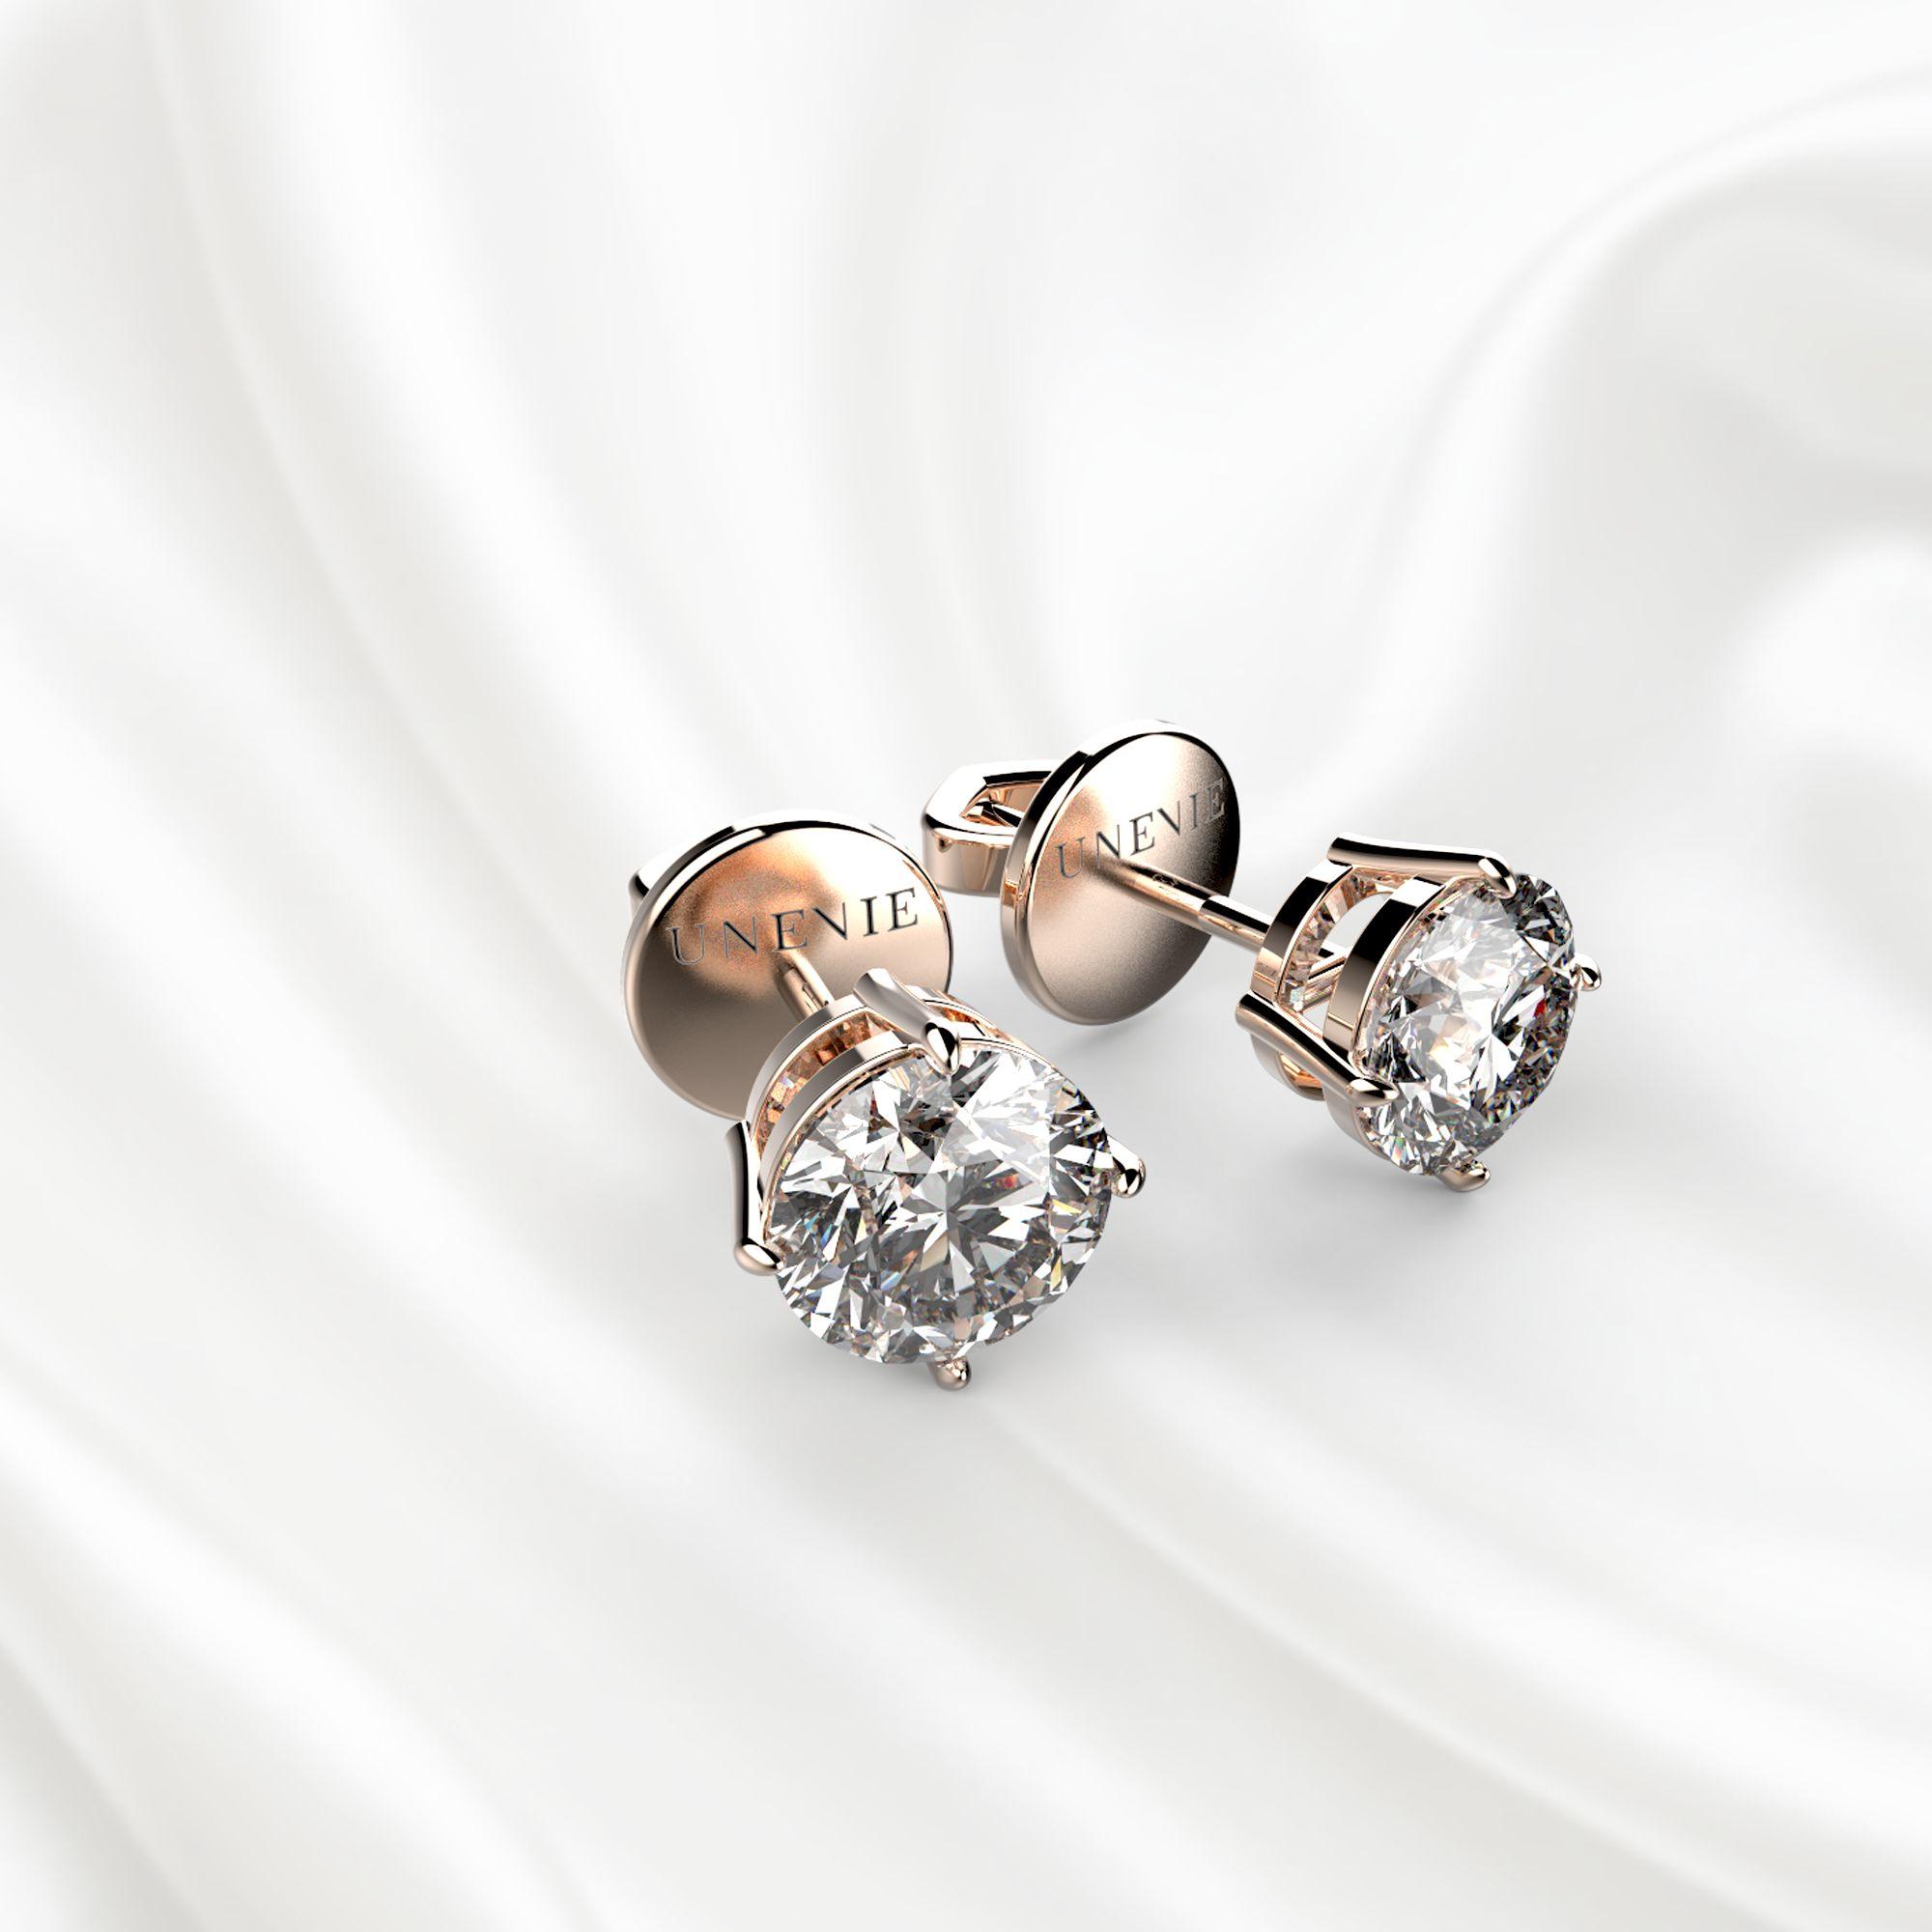 S3 Серьги из розового золота с бриллиантами 0,7 карат